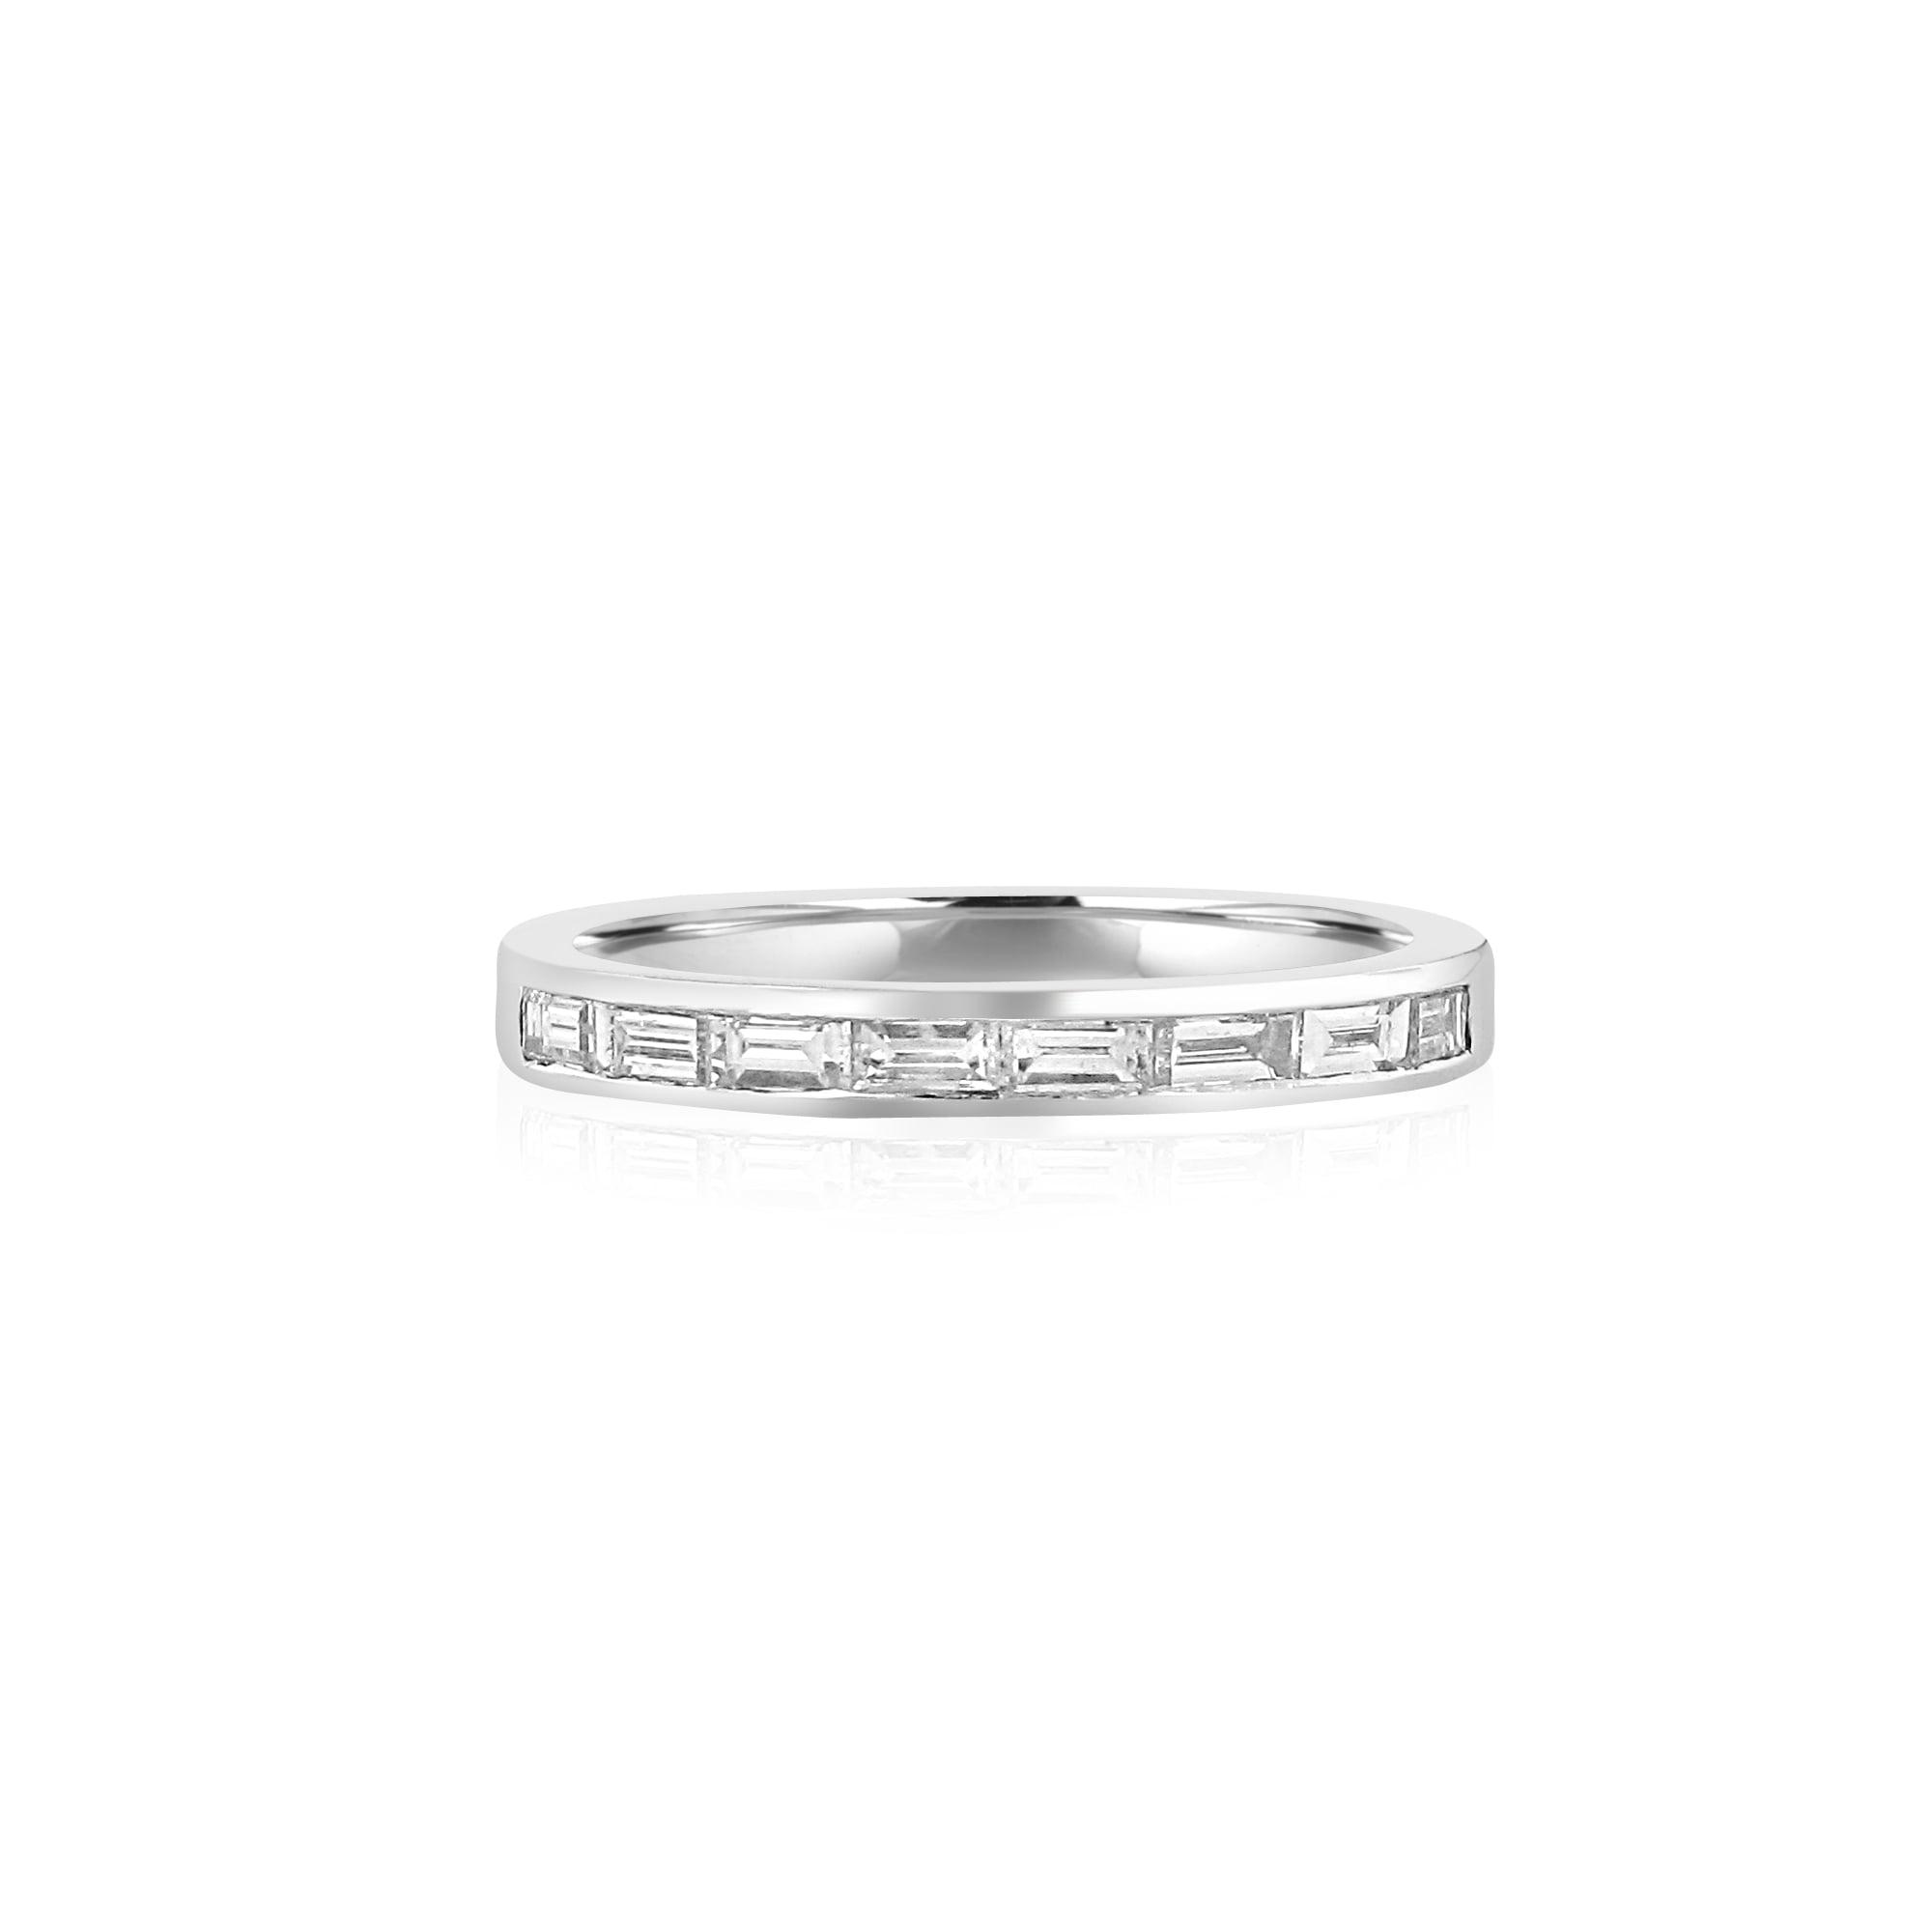 Avanti Platinum band Ring Set With Eight Baguette Diamonds